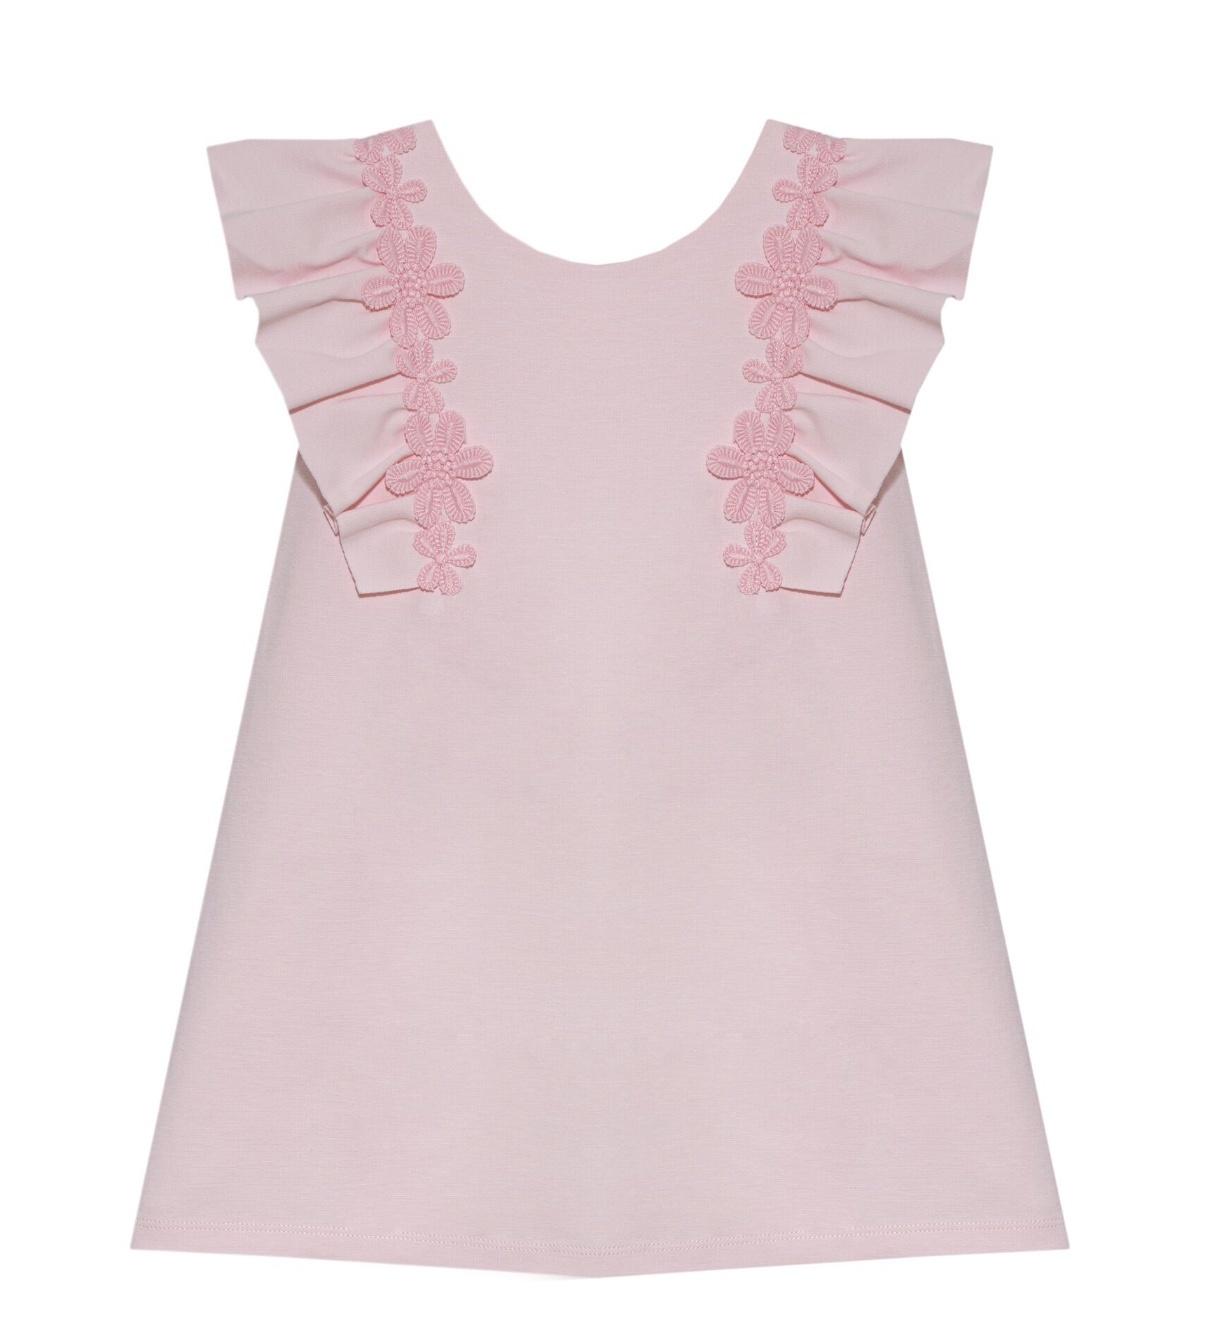 Patachou Patachou Girls 410 Pale Pink Flower Motif Dress